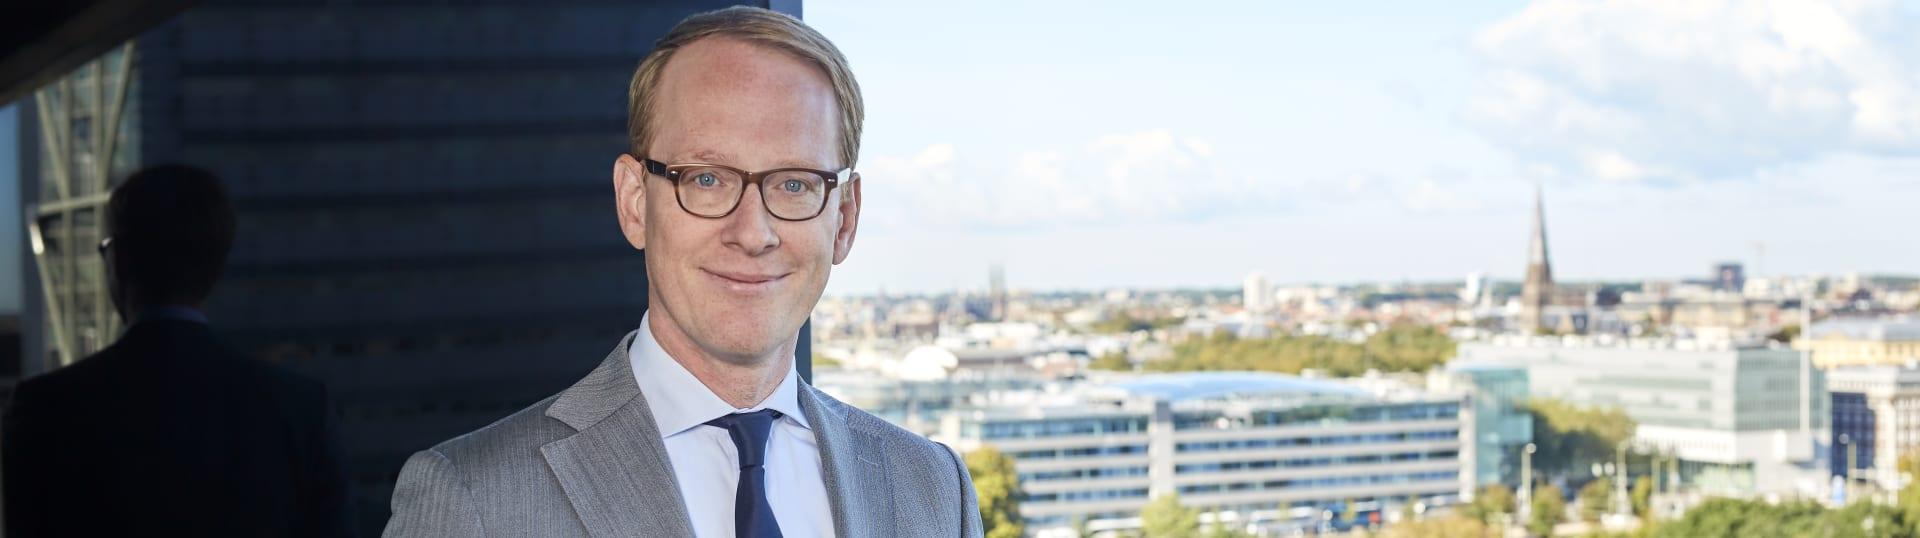 Wouter Admiraal, toegevoegd notaris Pels Rijcken